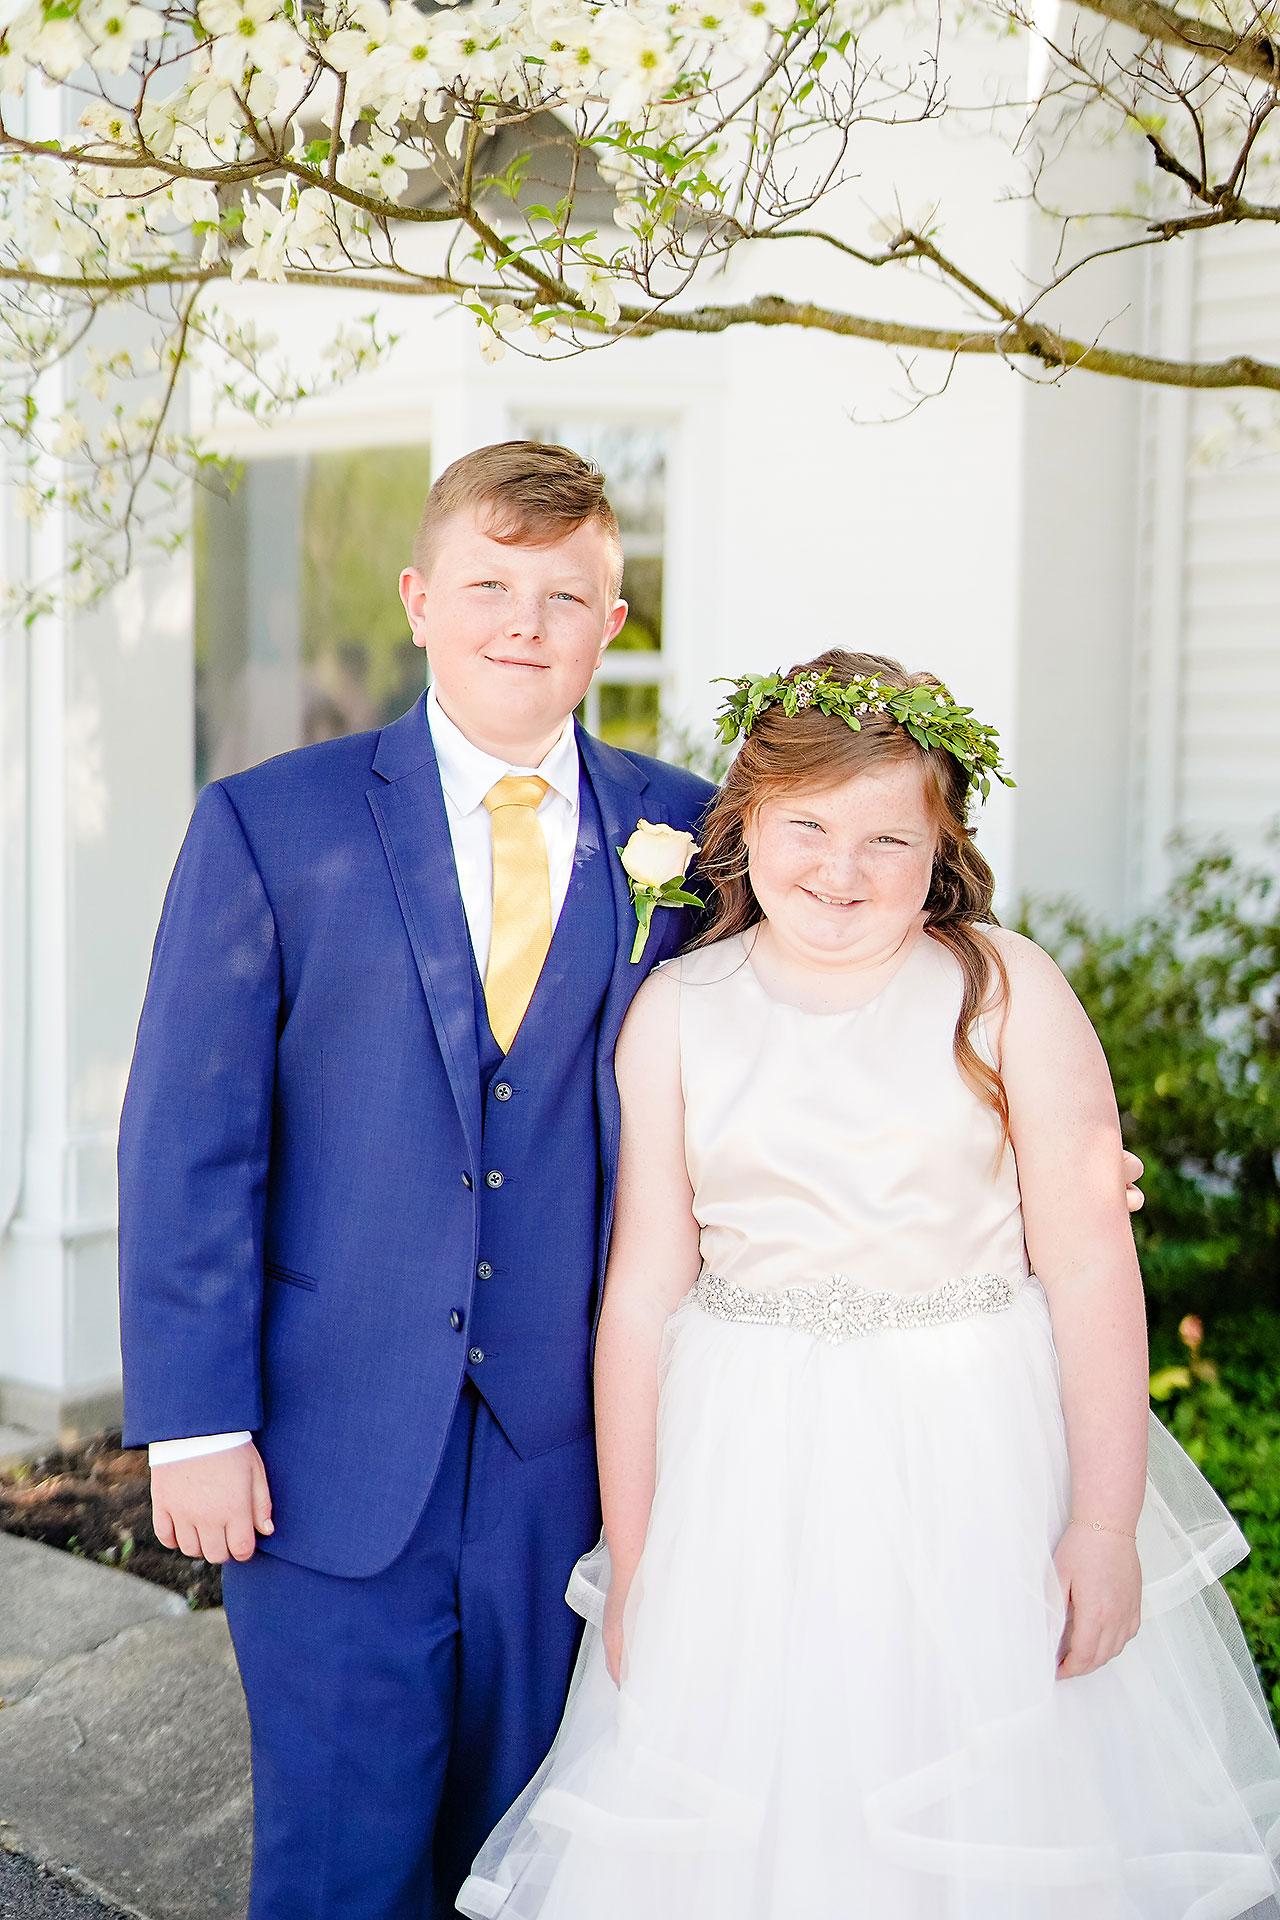 Nadia Parker Black Iris Estate Carmel Indiana Wedding May 2021 145